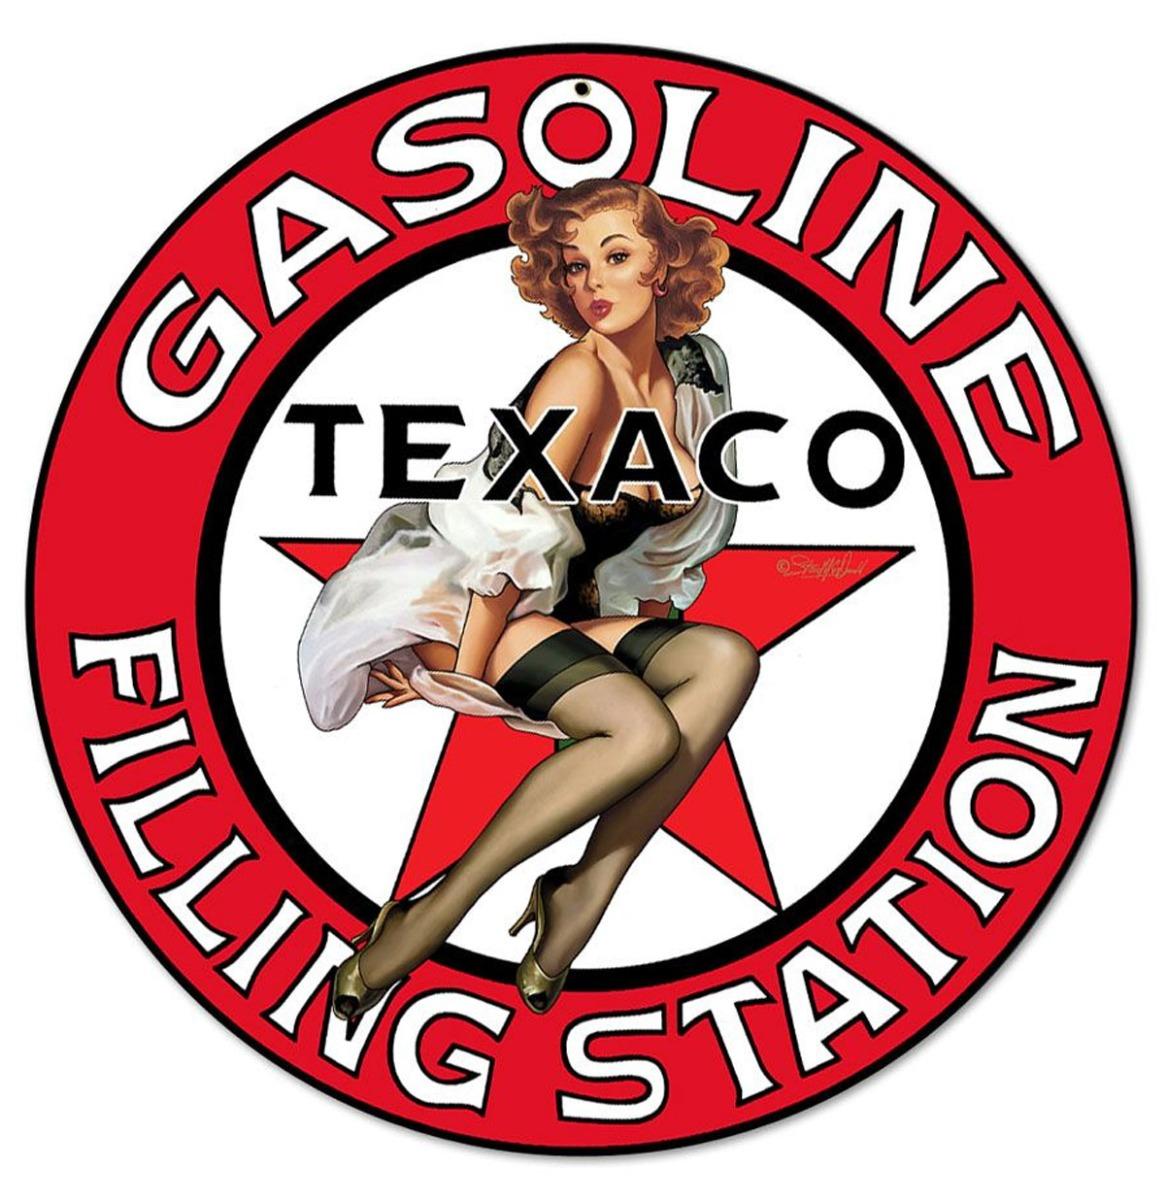 Gasoline Filling Station Texaco Pin-Up Girl Metalen Bord 36 cm